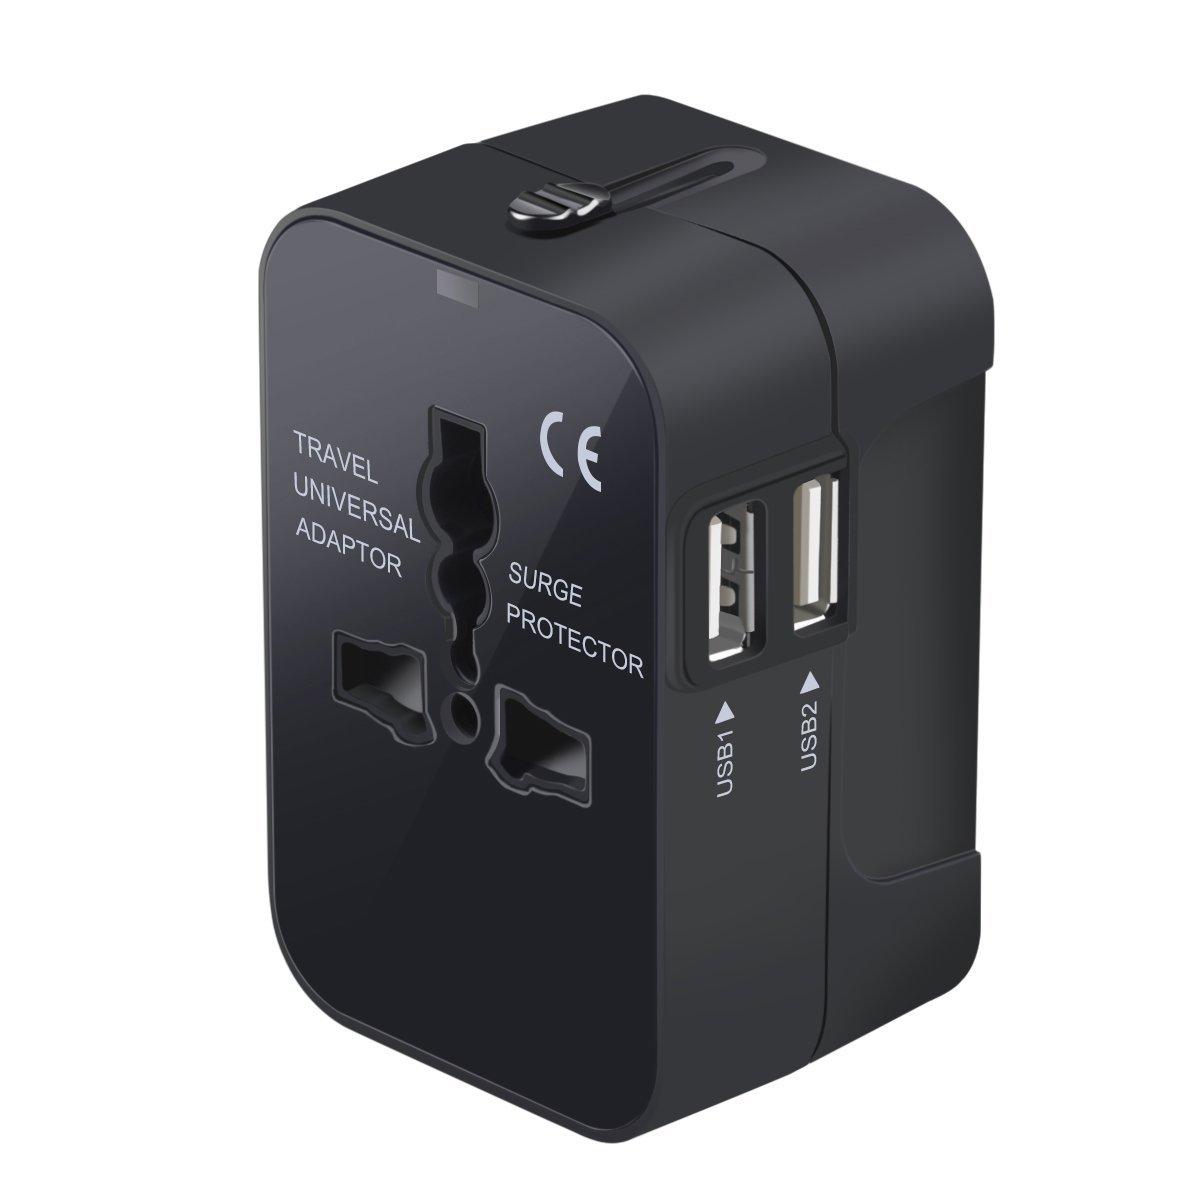 Travel Adapter - $11.99